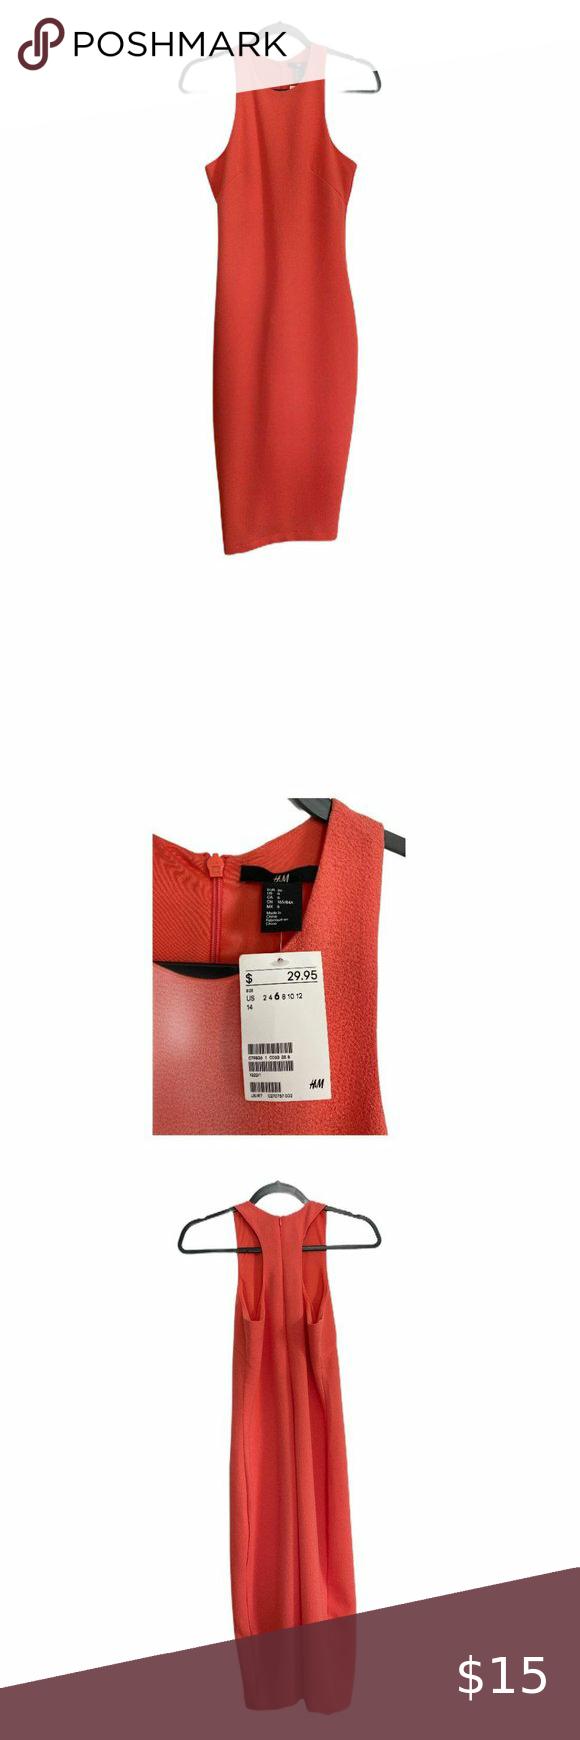 H M Coral Racerback Bodycon Dress Midi Sz 6 Nwt Bodycon Dress Midi Dress Bodycon Midi Dress [ 1740 x 580 Pixel ]